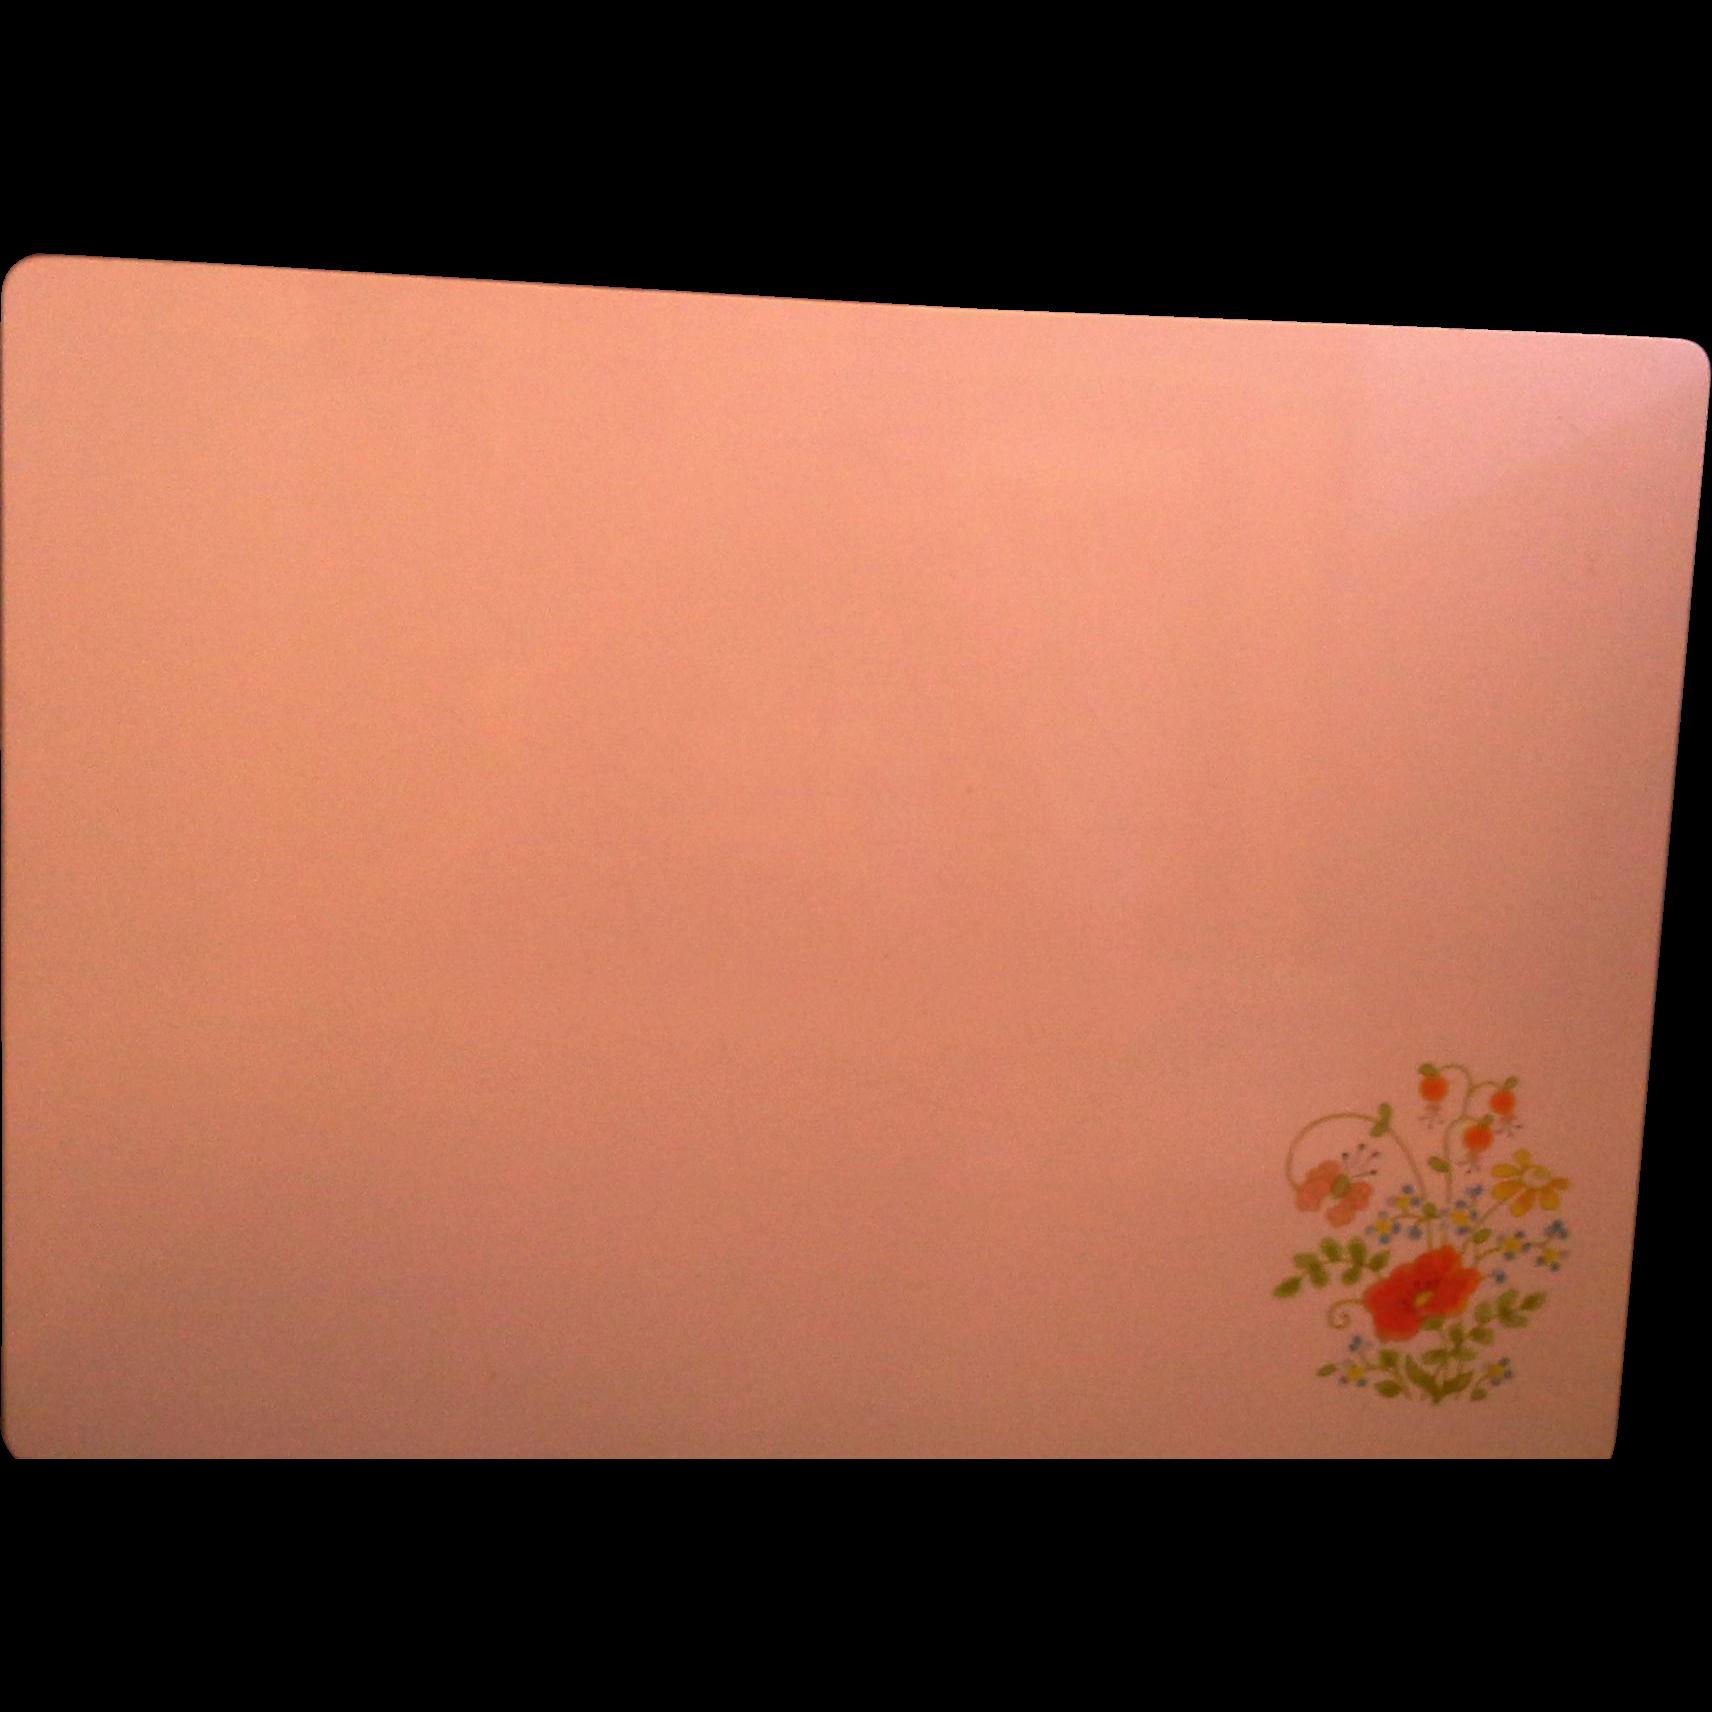 Corning Wildflower White Counter Saver 10 x 14 Cutting Board Trivet